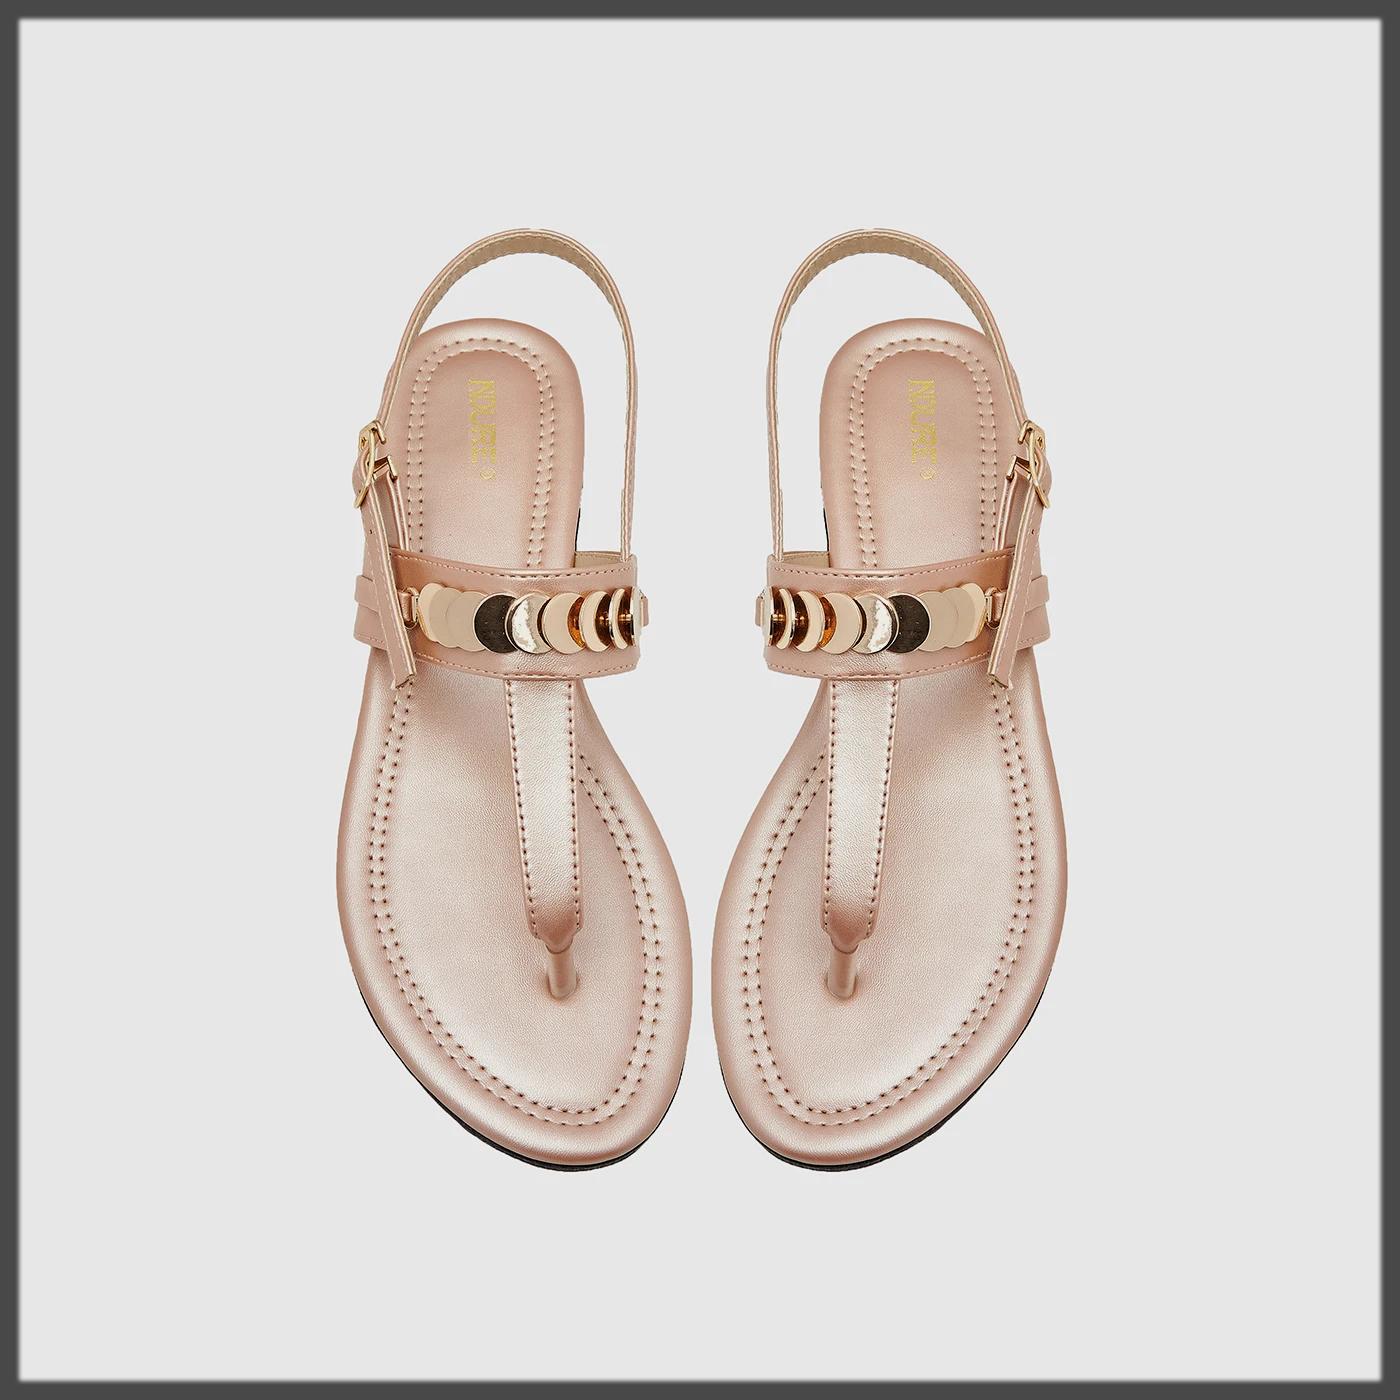 Impressive Summer Sandals by Ndure